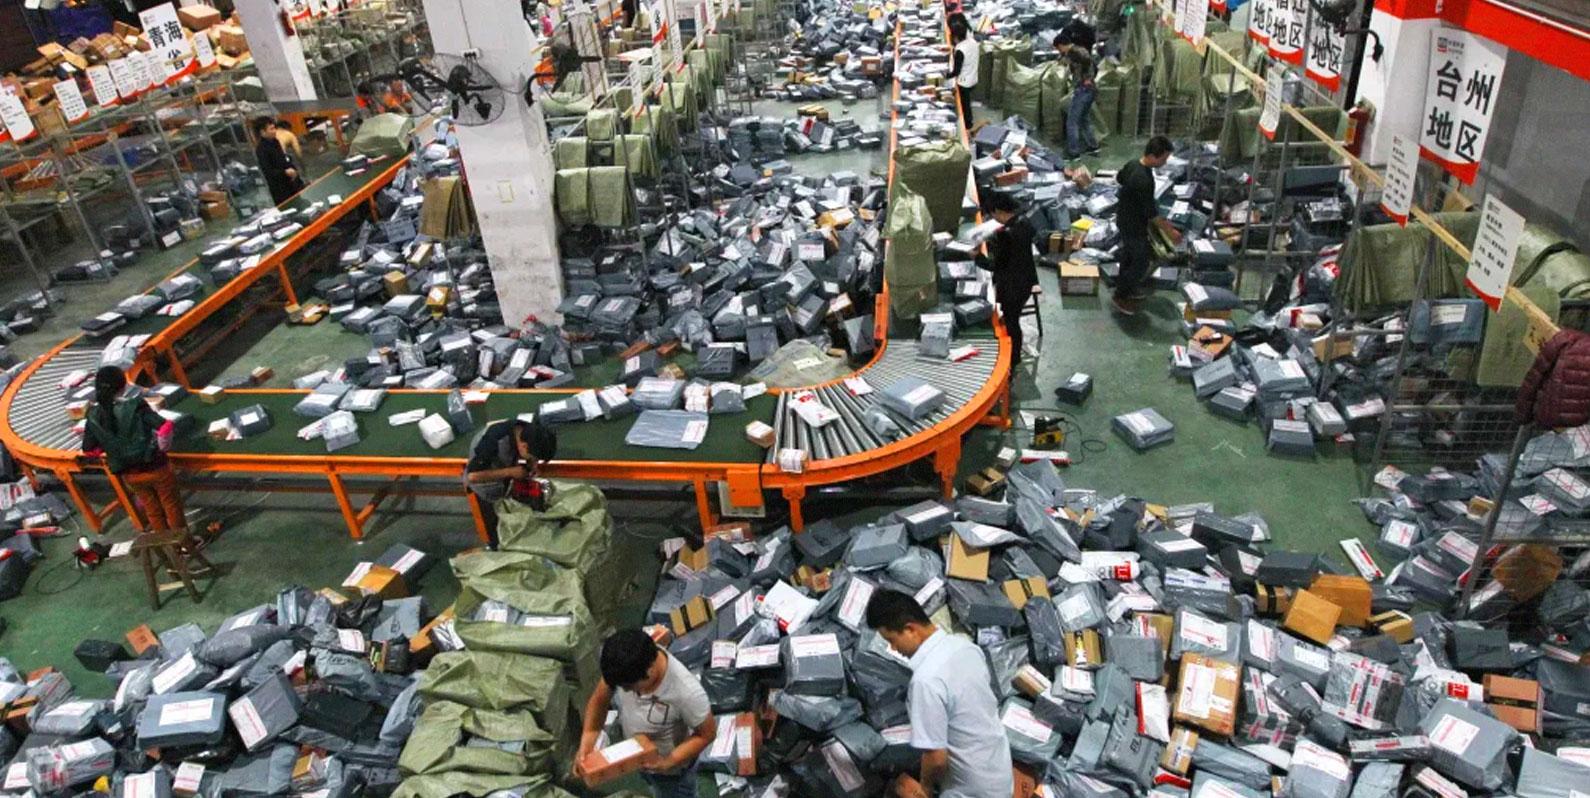 Como a pandemia preparou a Inteligência Artificial do Grupo Alibaba para o maior dia de compras do mundo